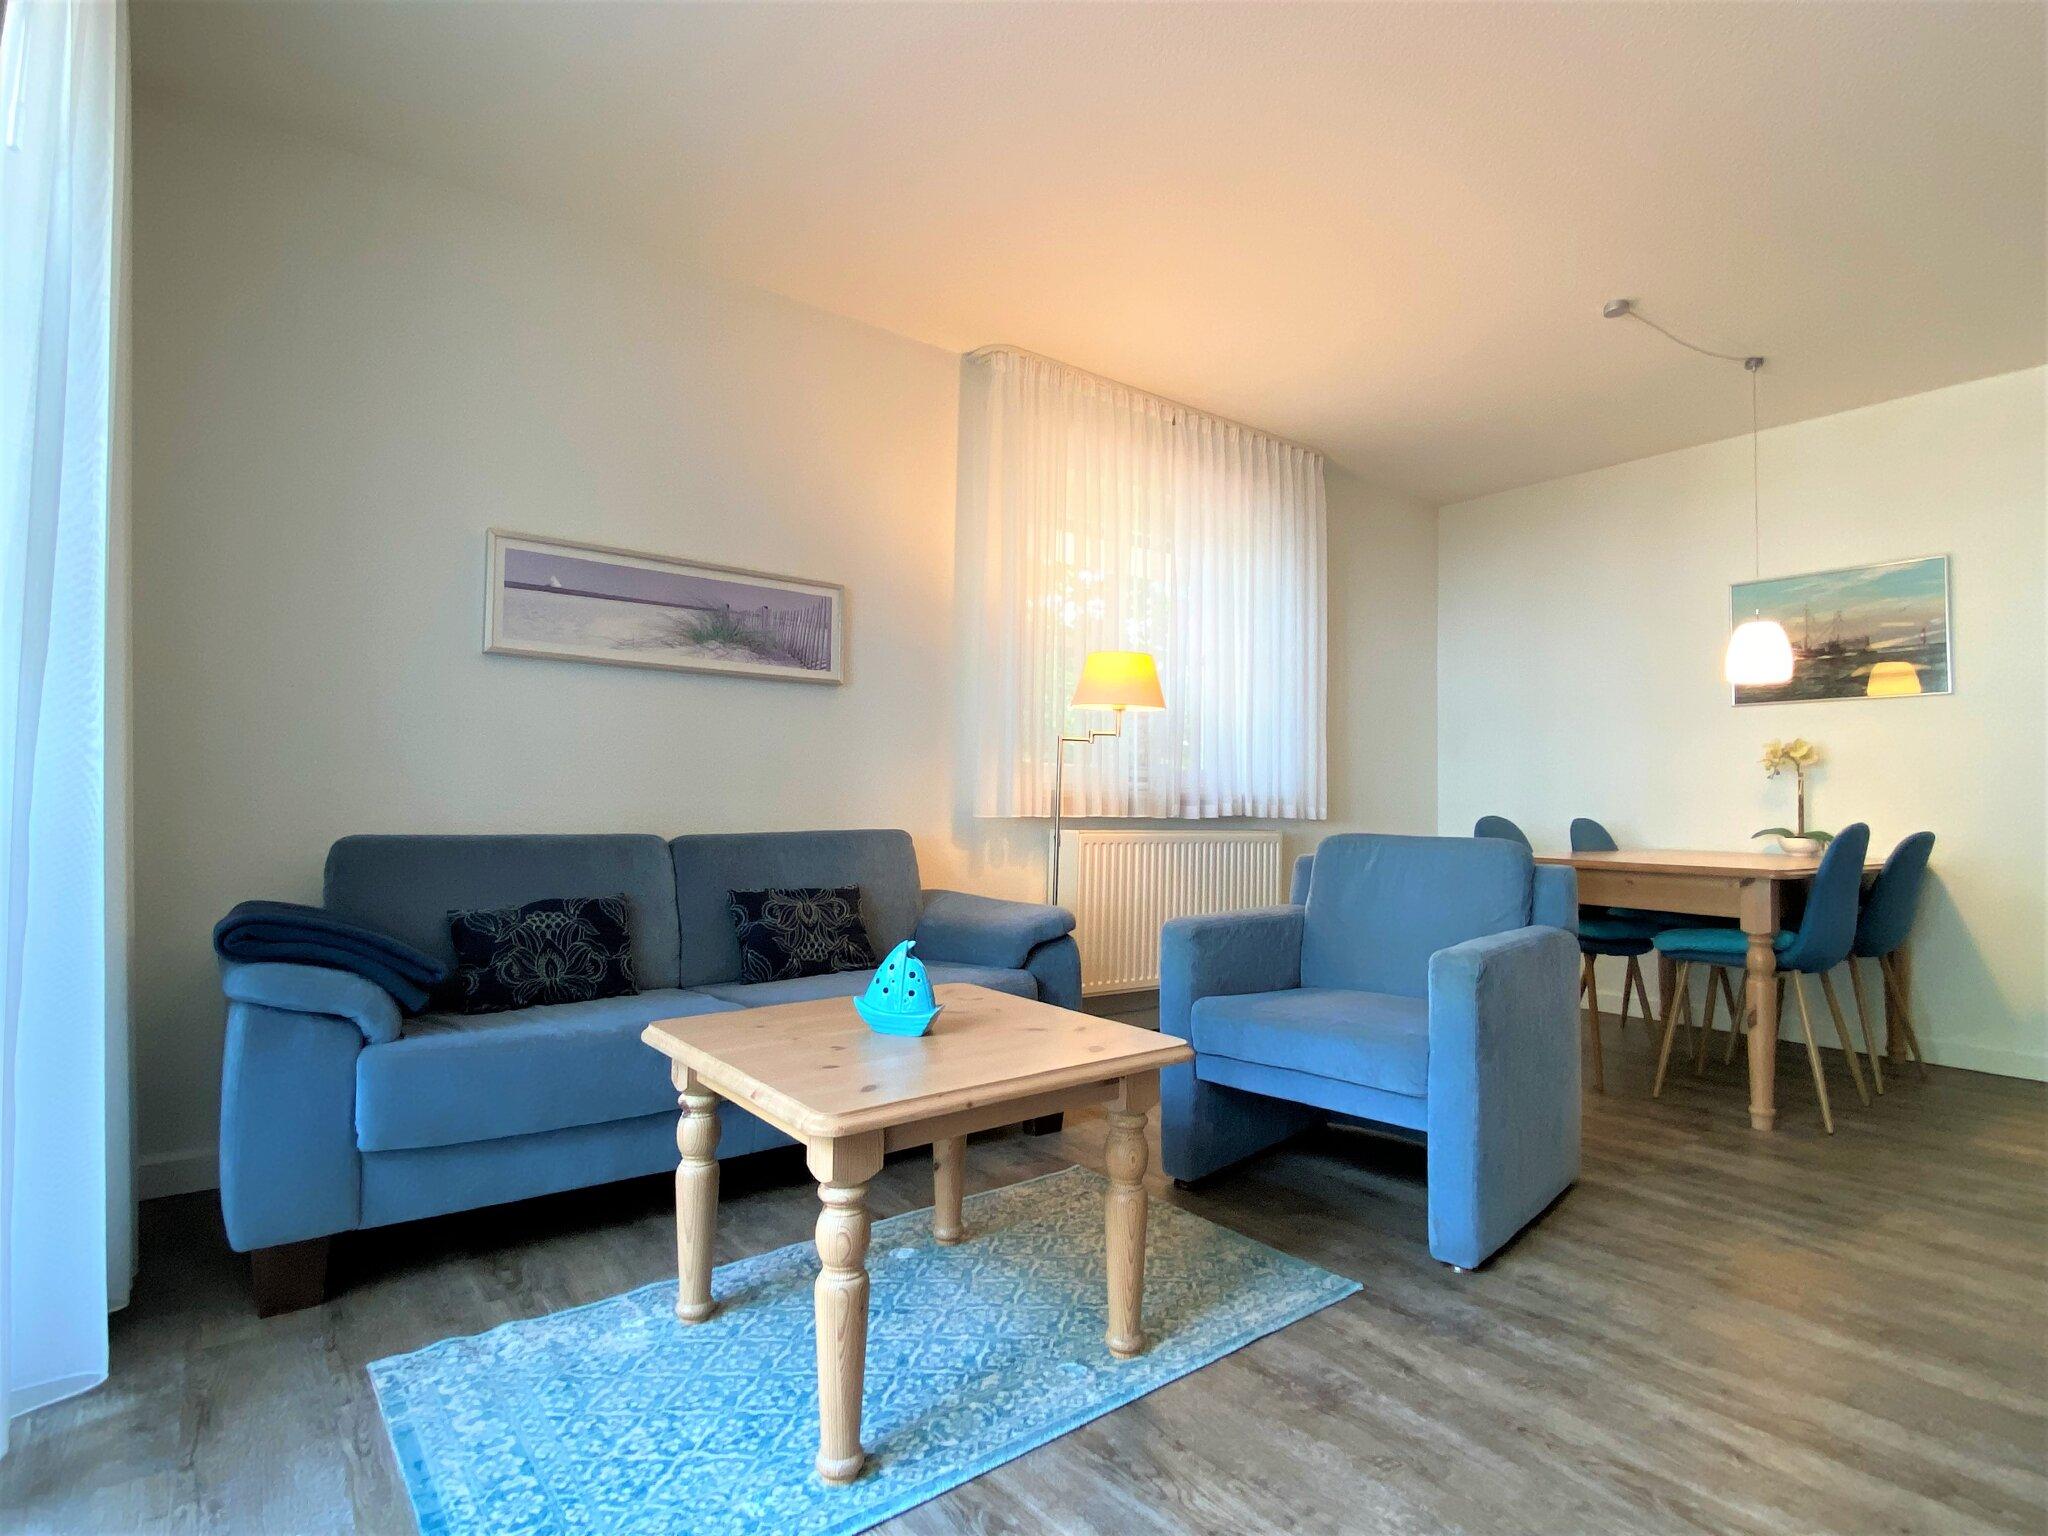 Apartmenthaus 'Am Nordseestrand' - Whg. 6